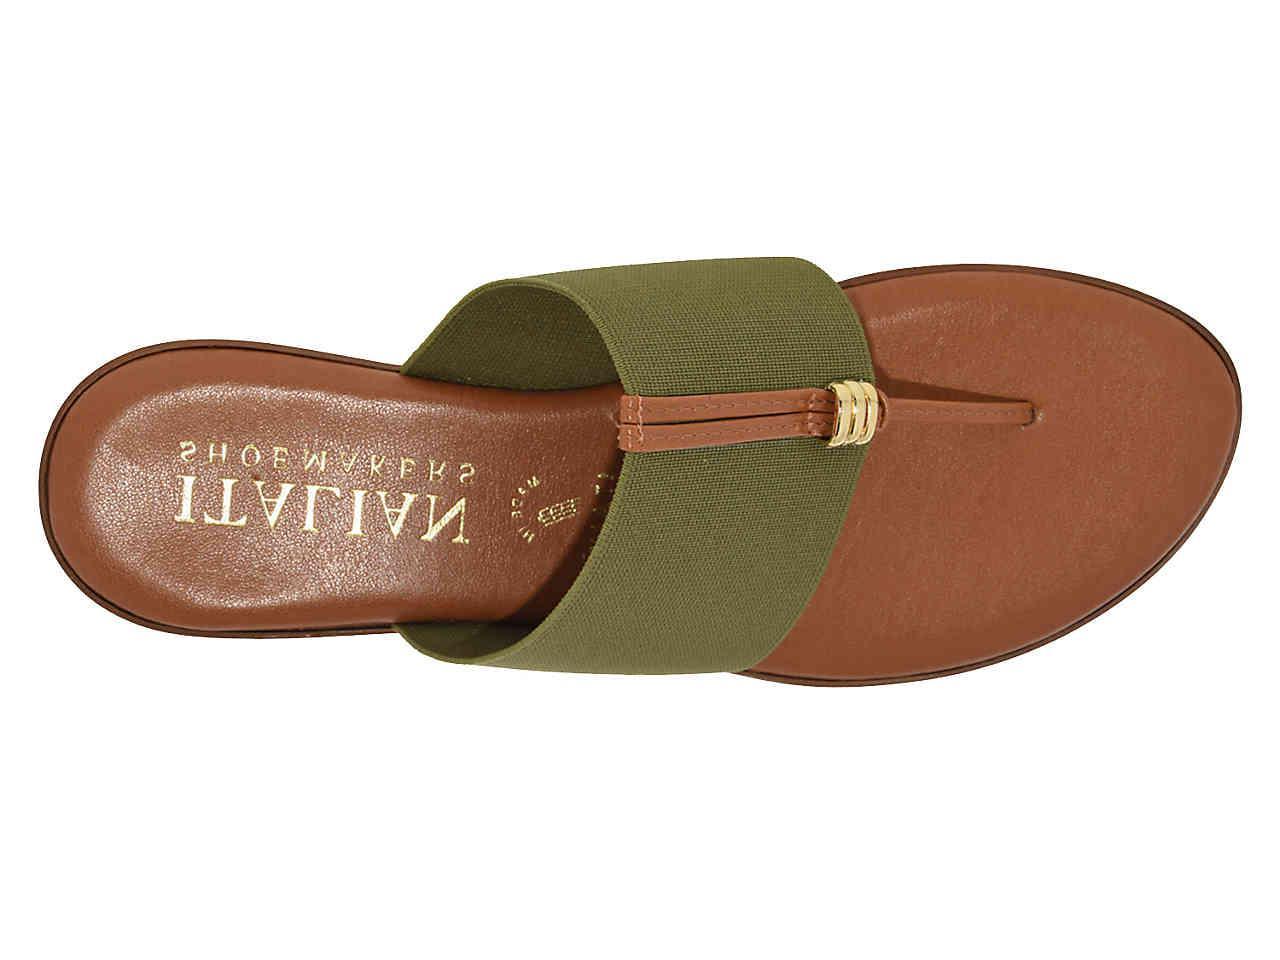 Italian Shoemakers Sutton Sandal in